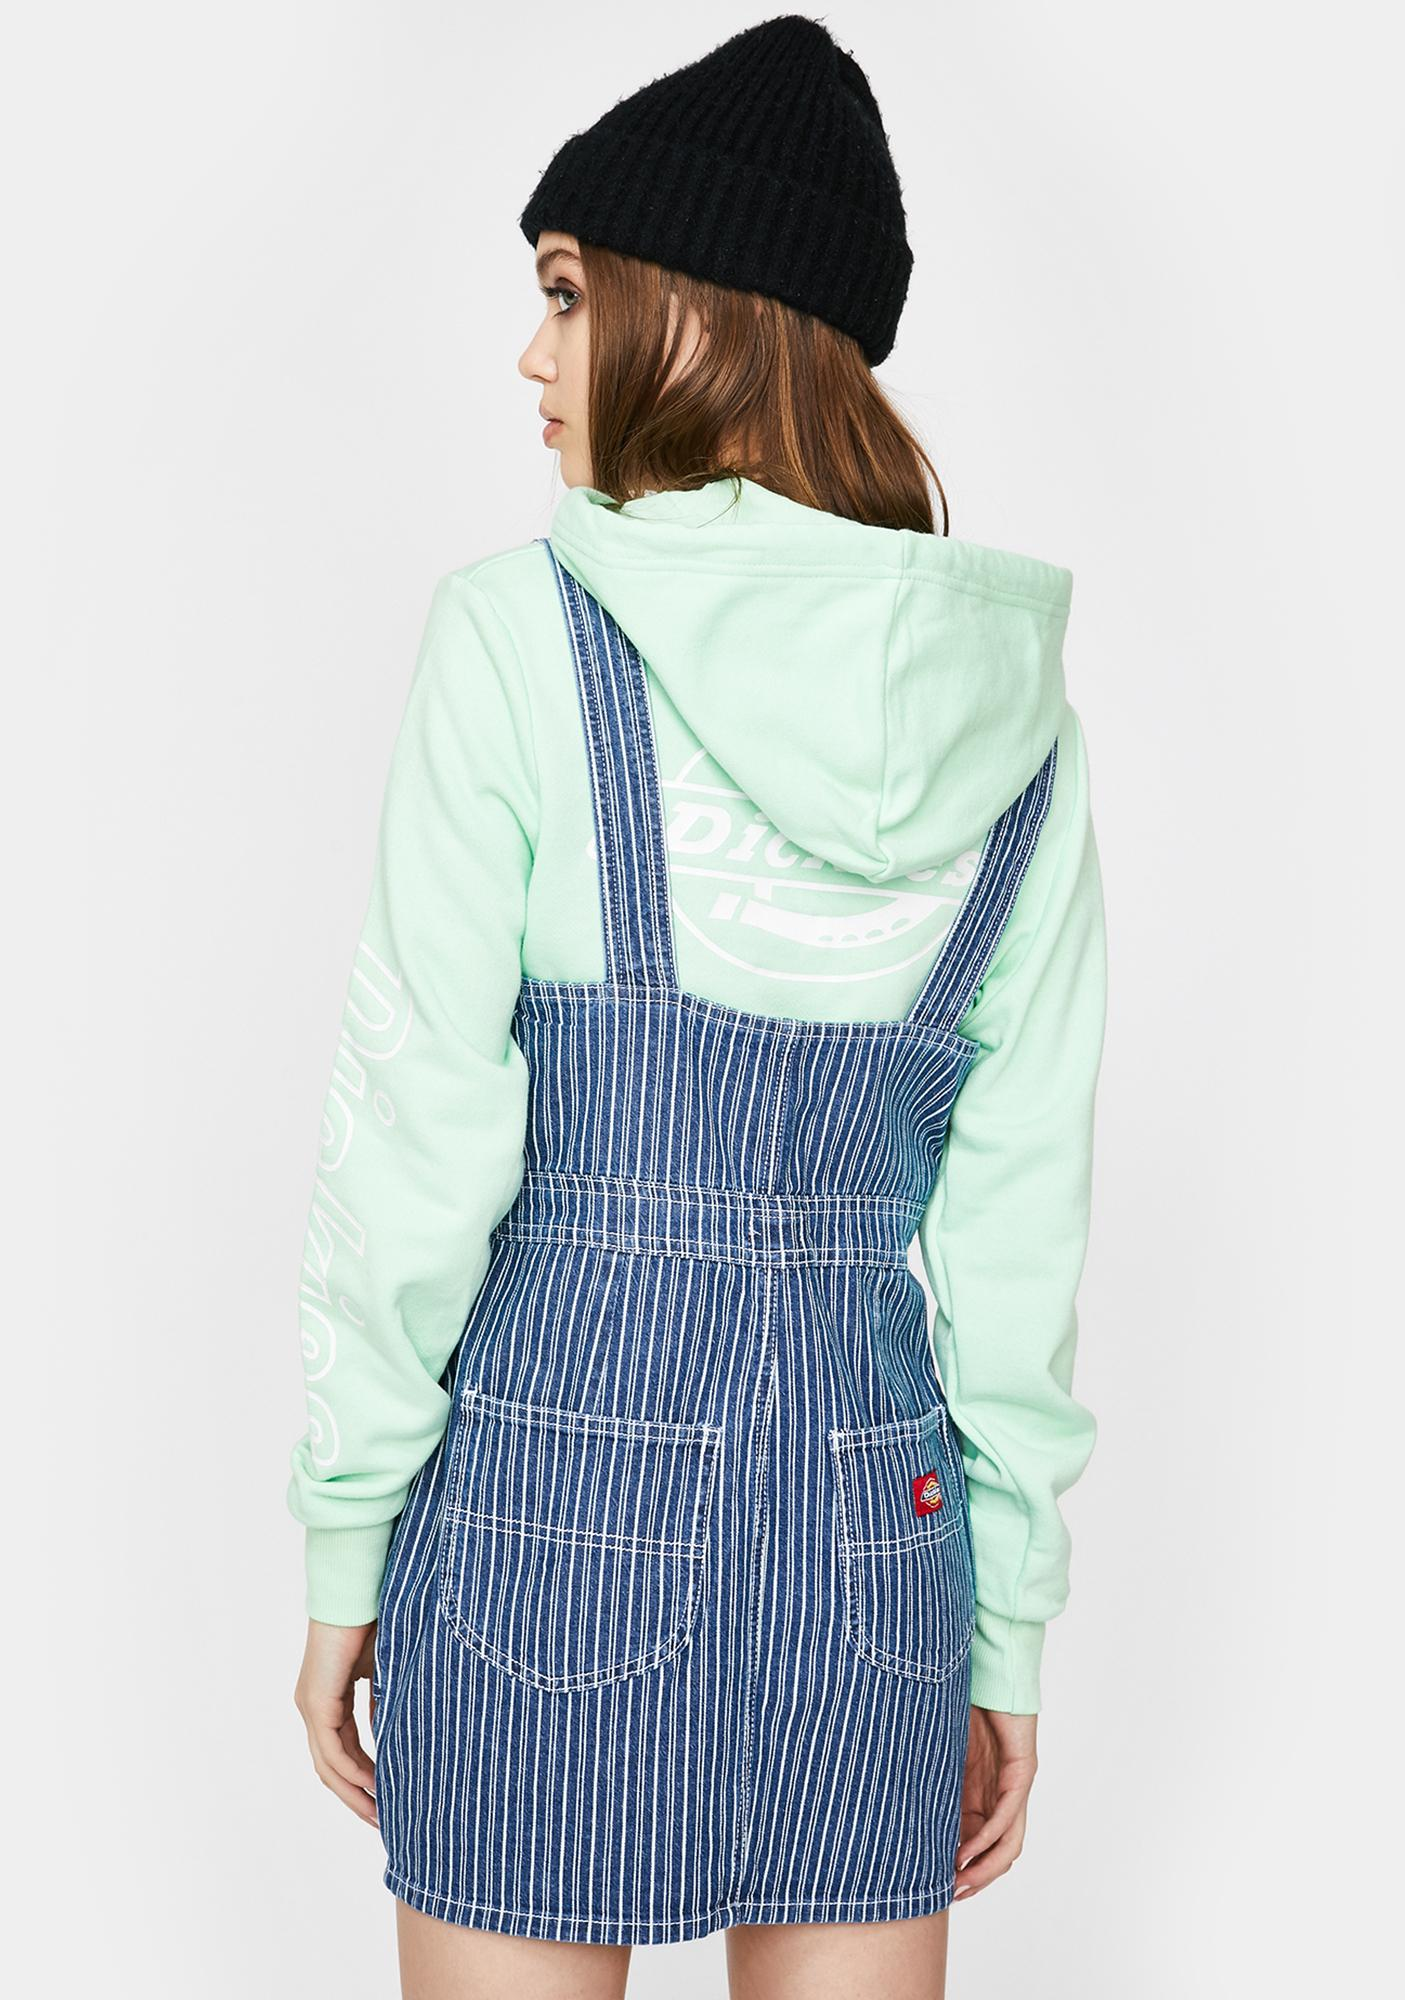 Dickies Girl Denim Striped Zip Up Overall Dress